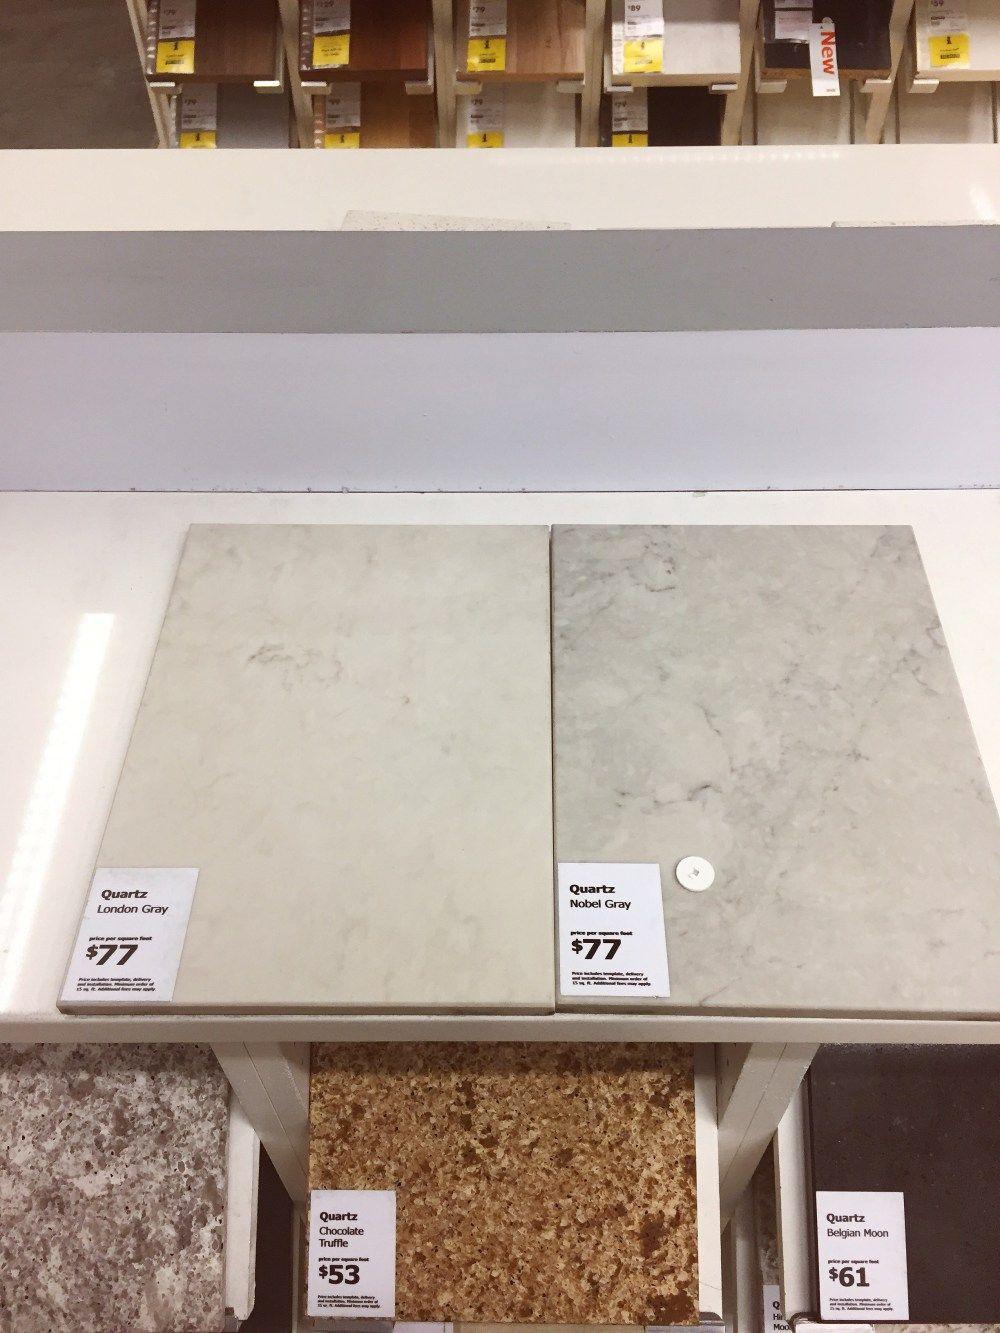 London Grey Vs Nobel Grey Caesarstone Ikea Quartz Countertop